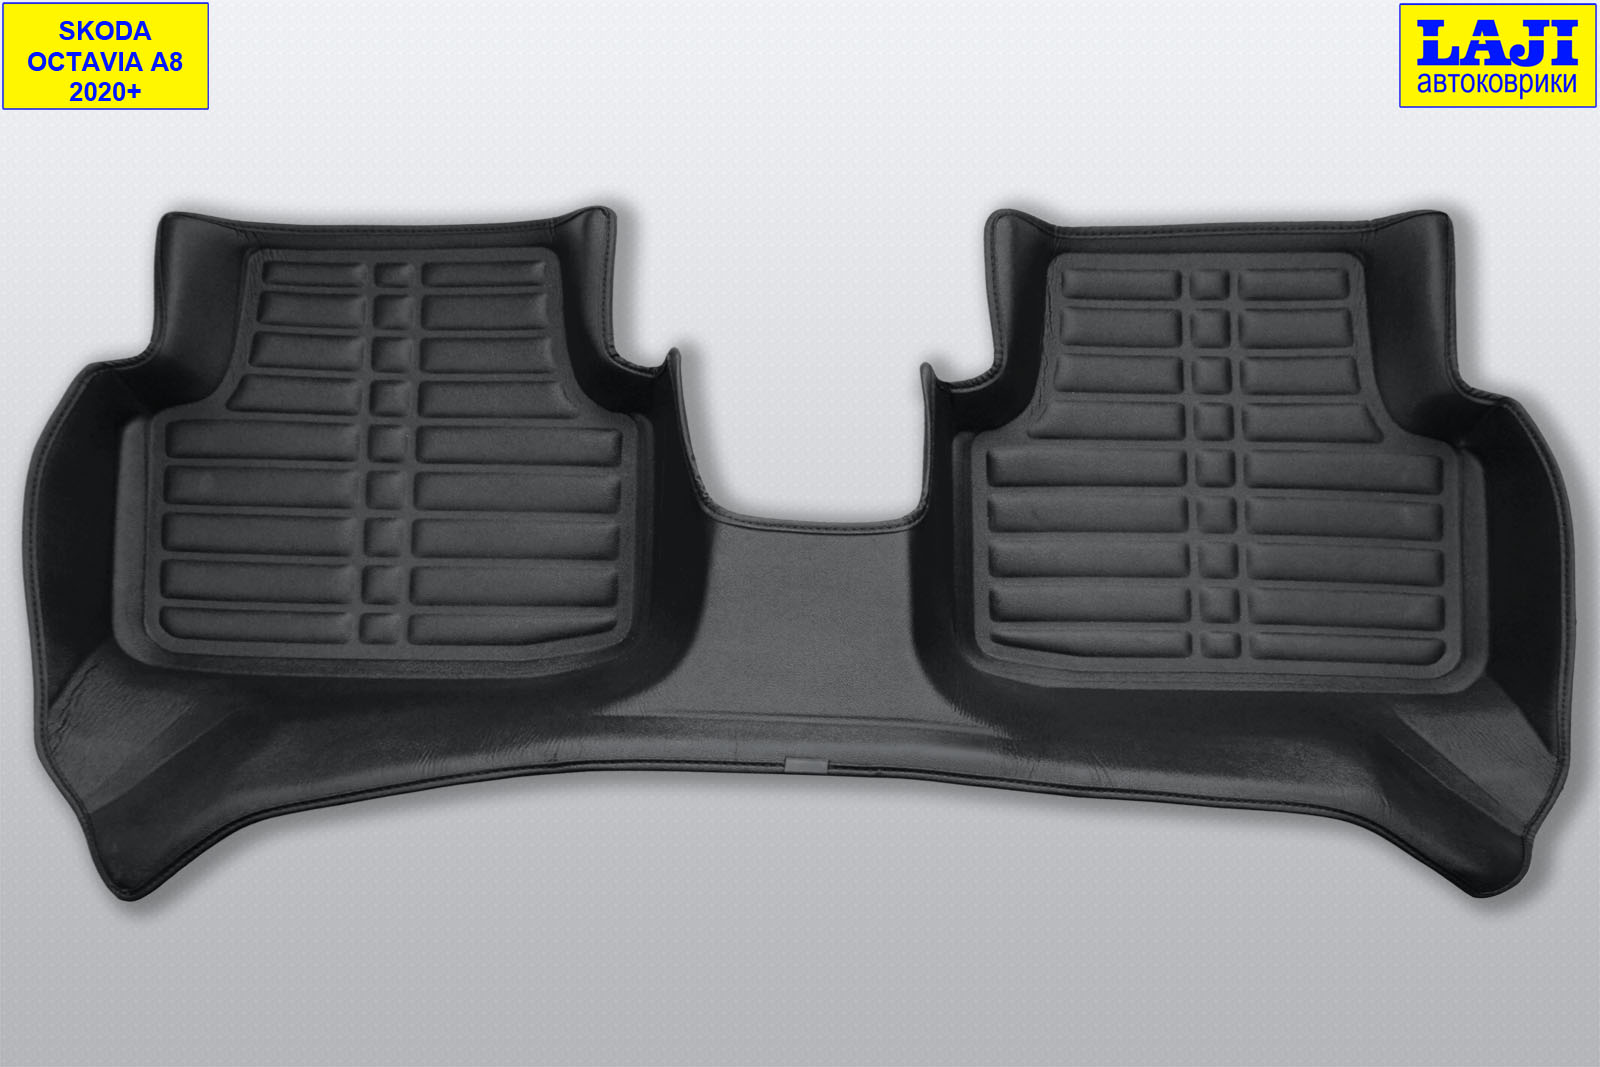 5D коврики в салон Skoda Octavia A8 2020-н.в. 10